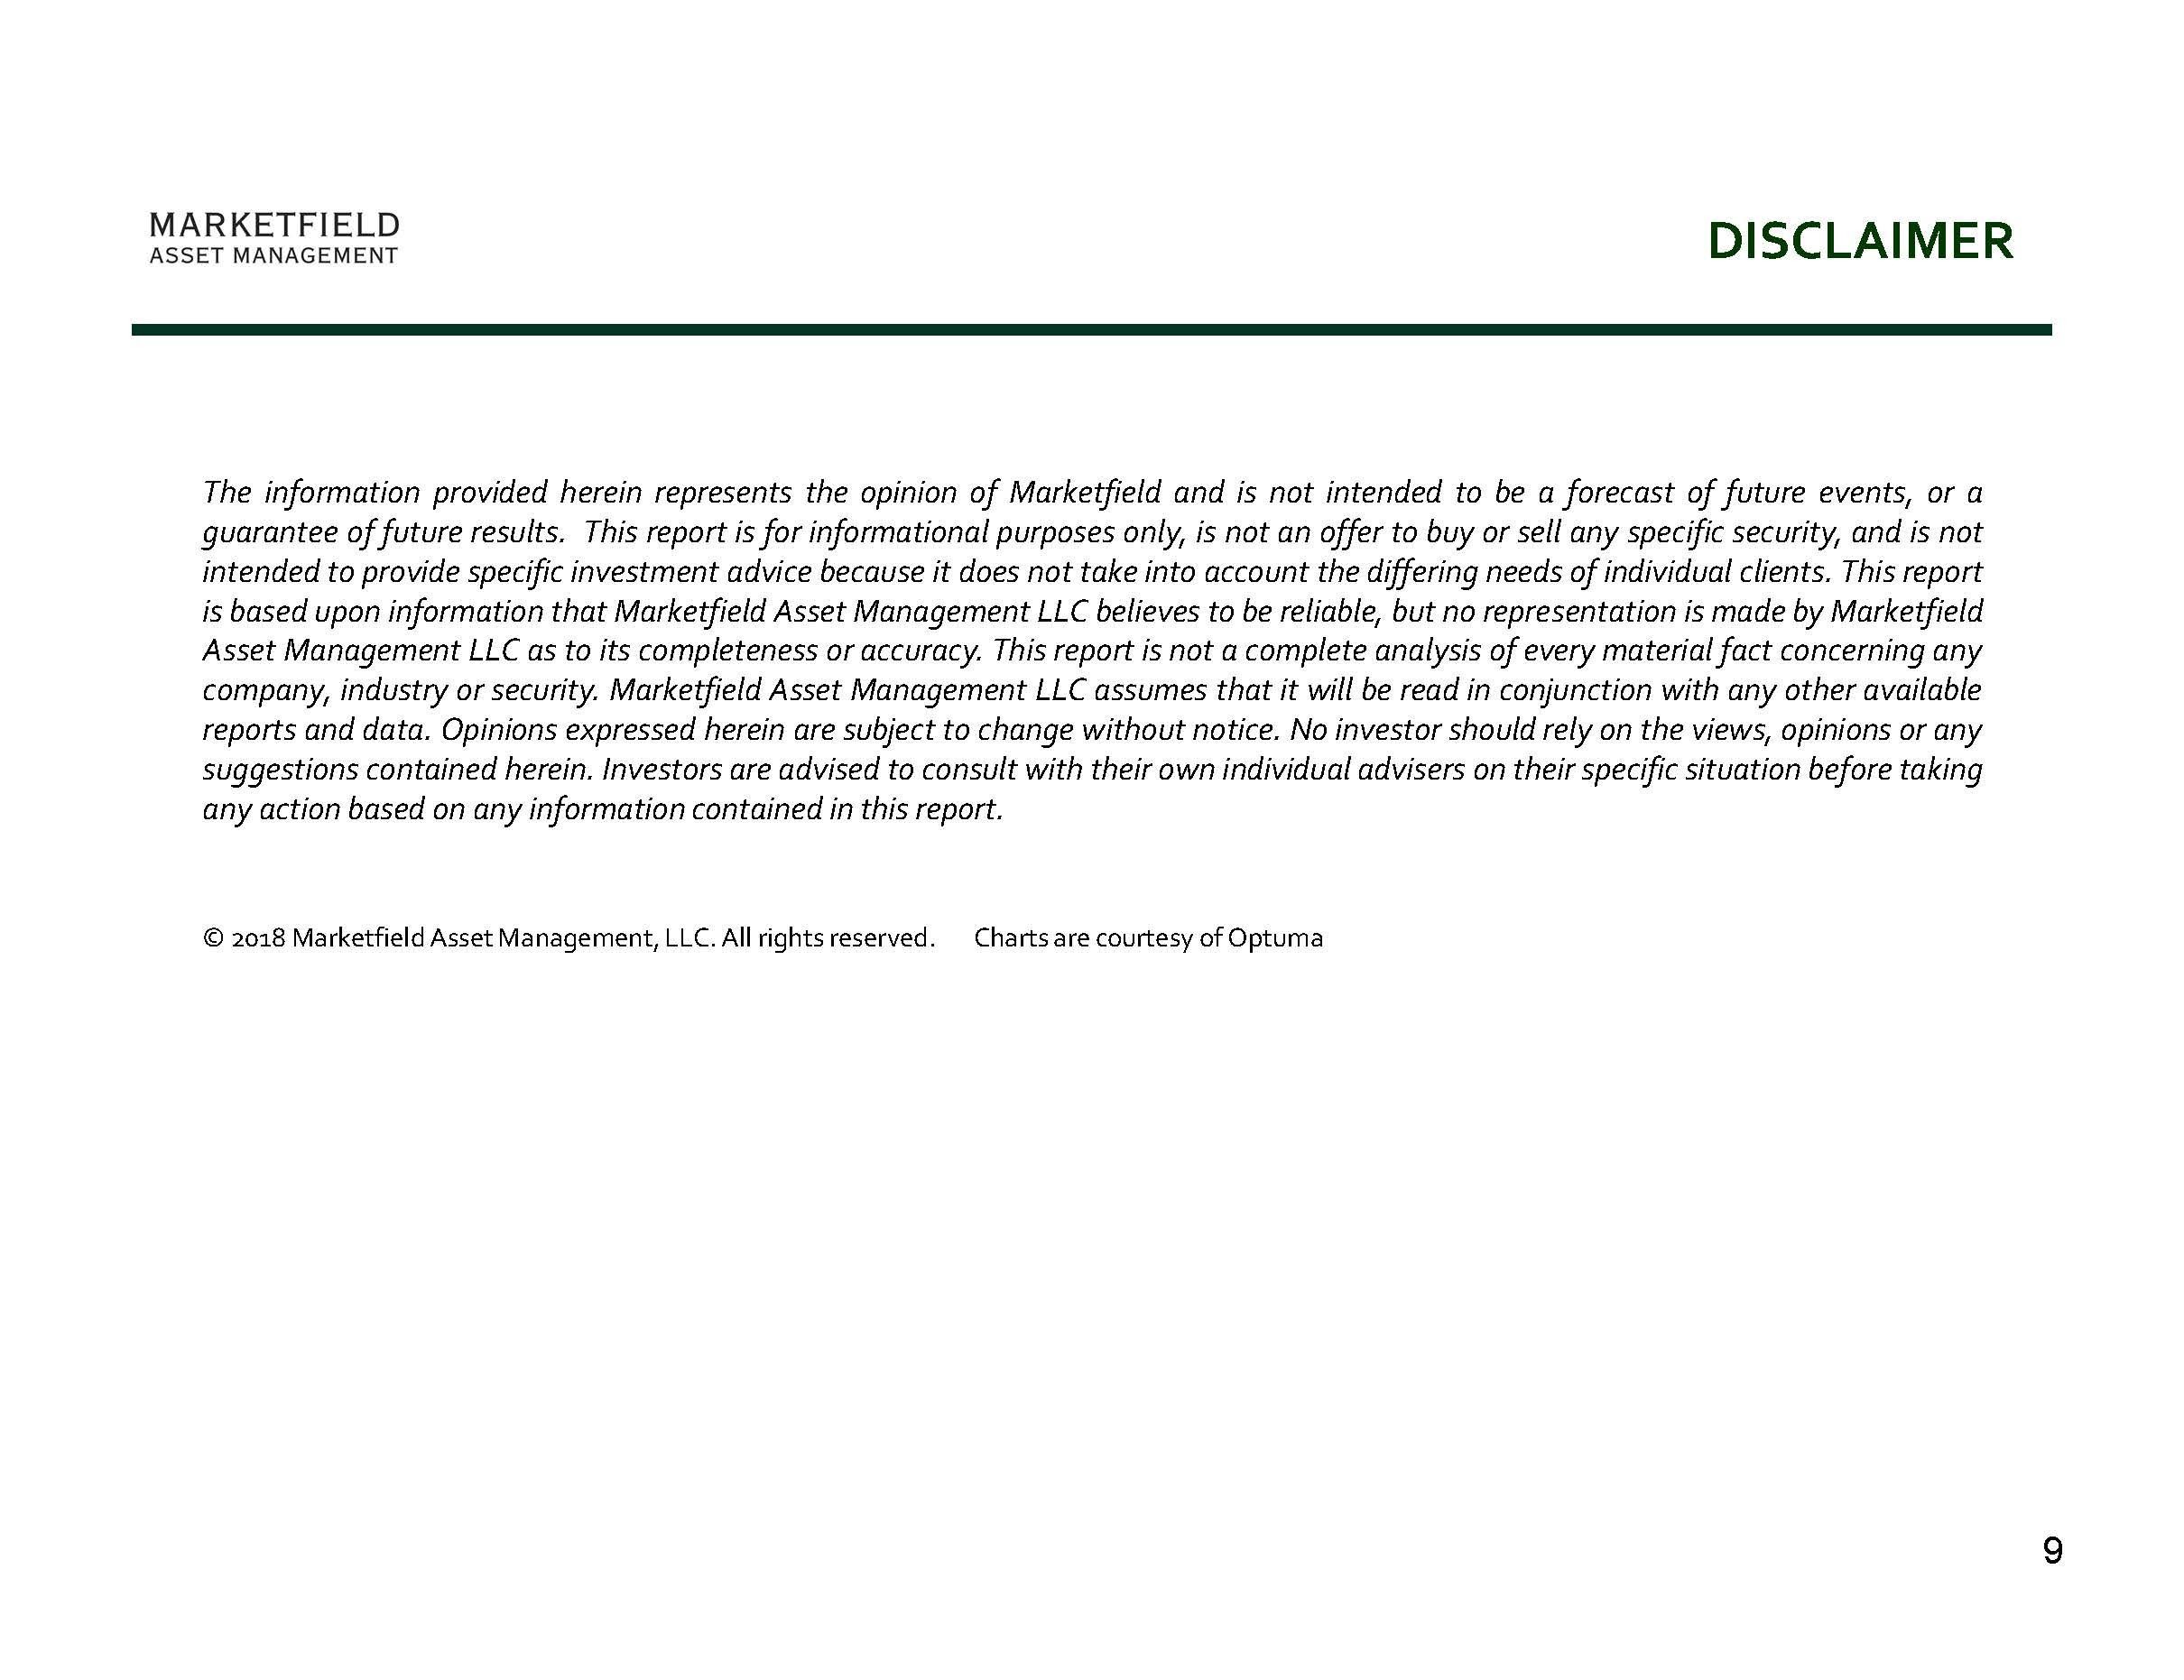 10-1-18_MarketsETF_Page_9.jpg